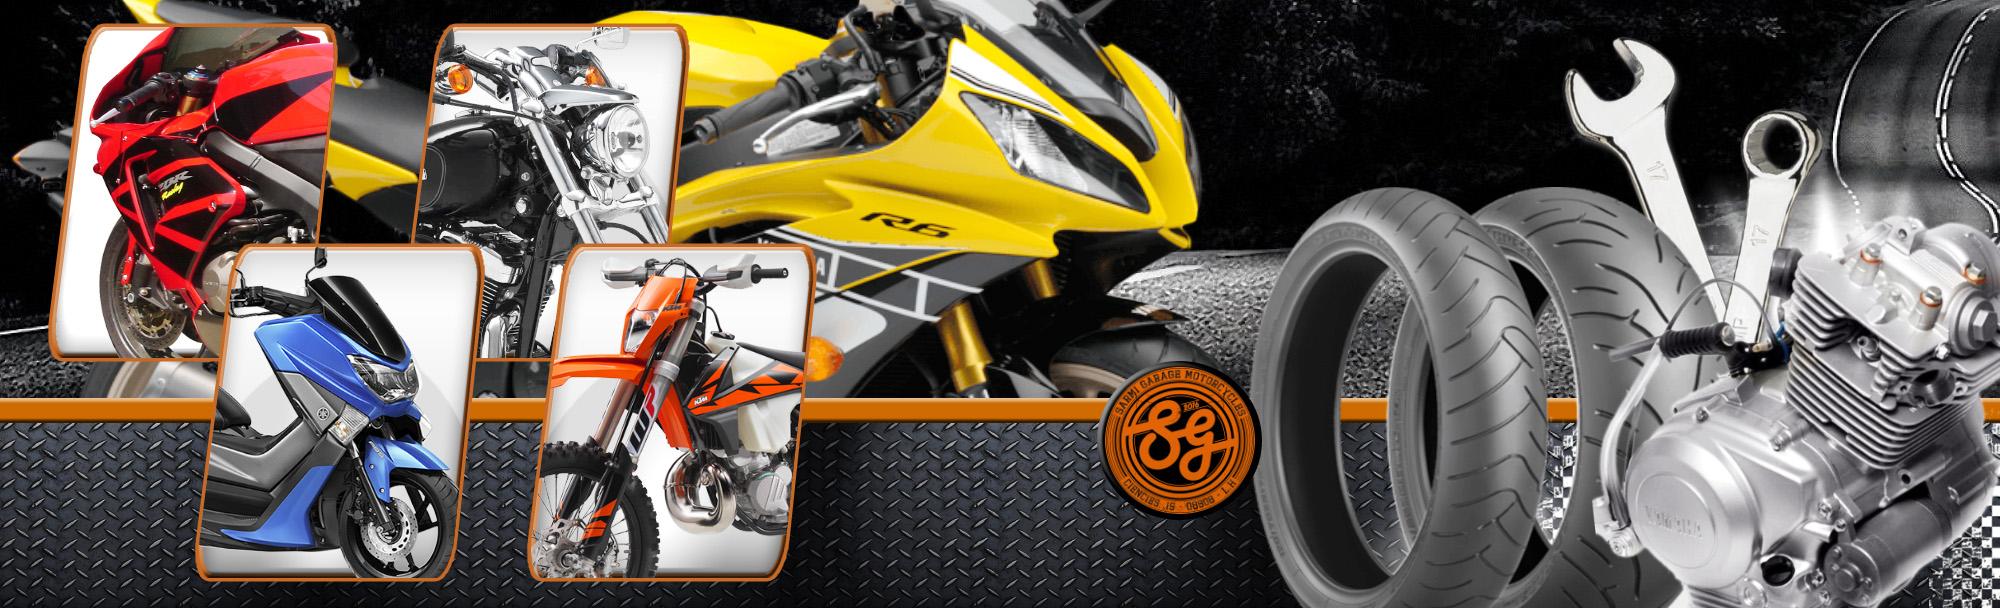 mecanico motos barcelona, reparar motos hospitalet baix llobregat